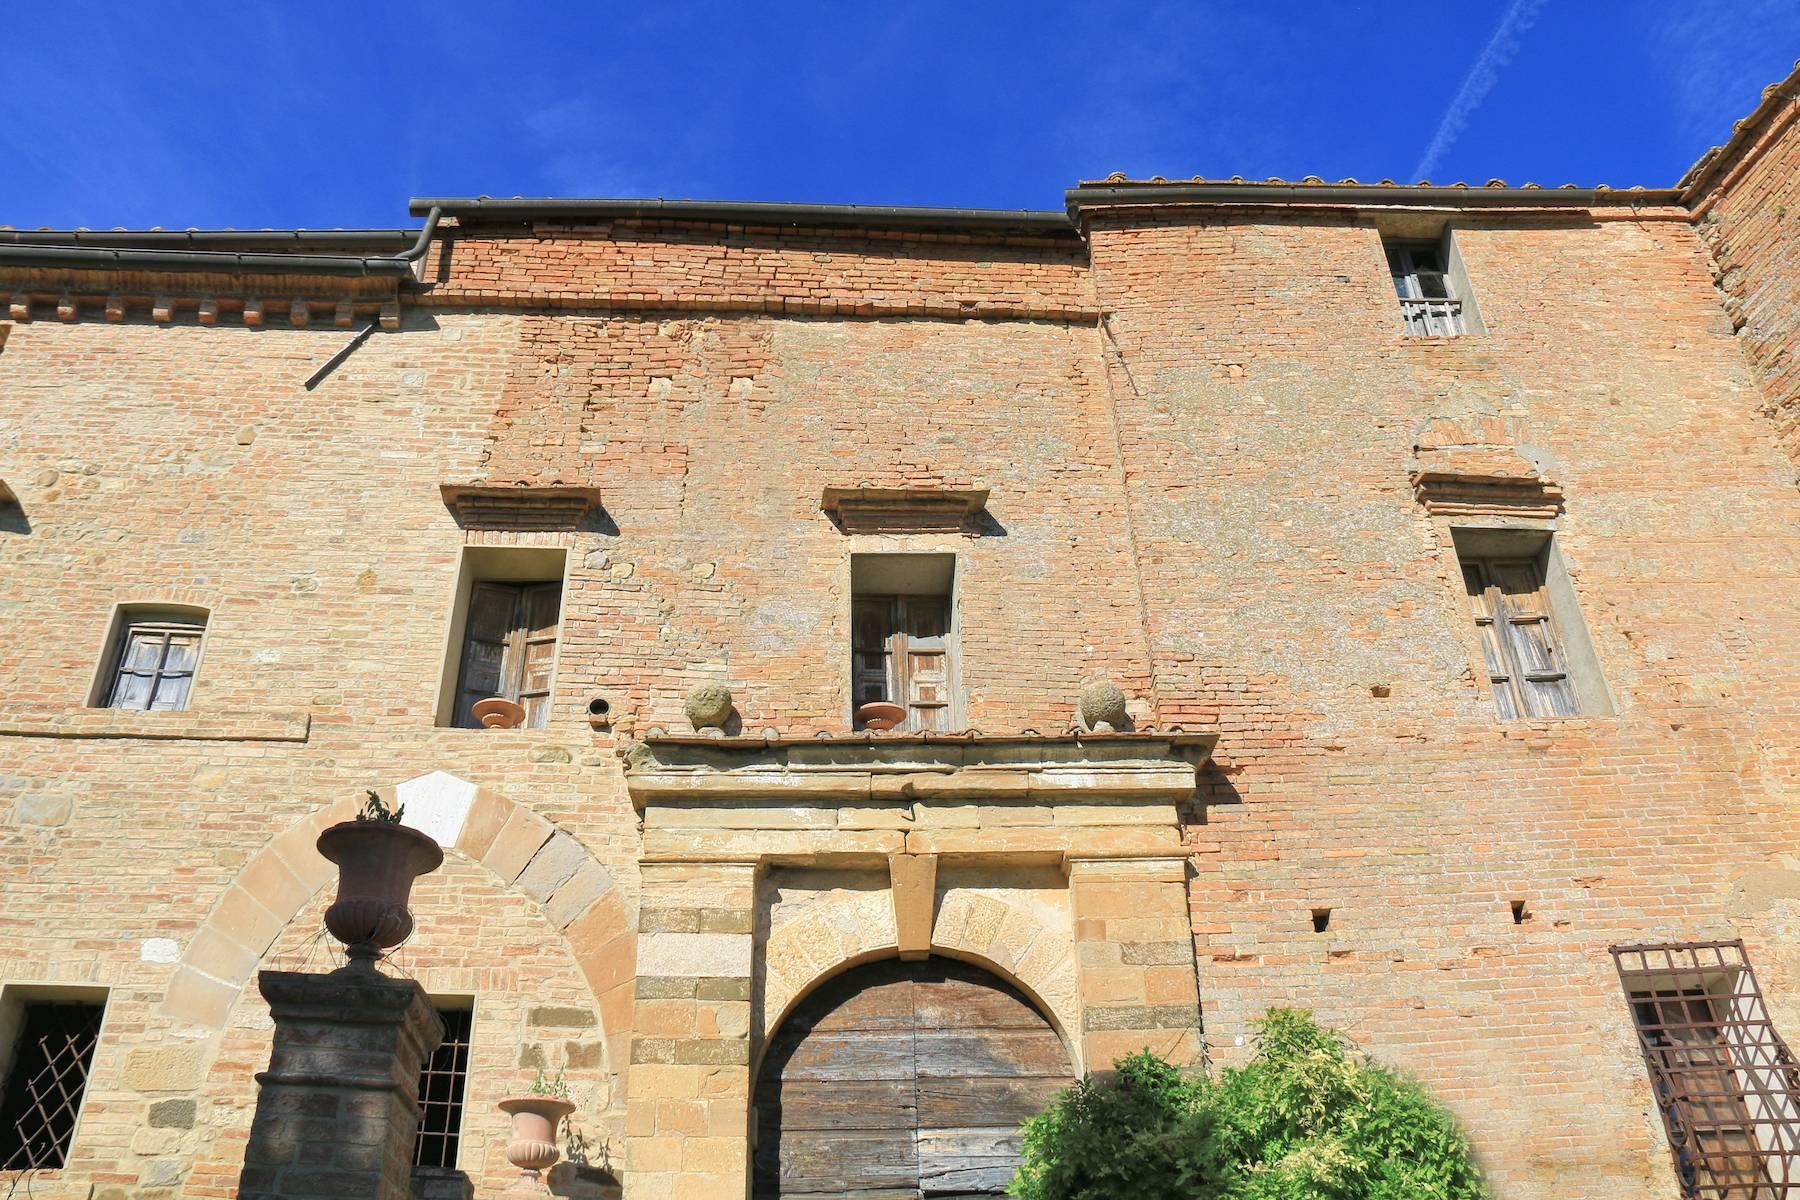 Wunderschönes Schloss im Herzen der Toskana - 5